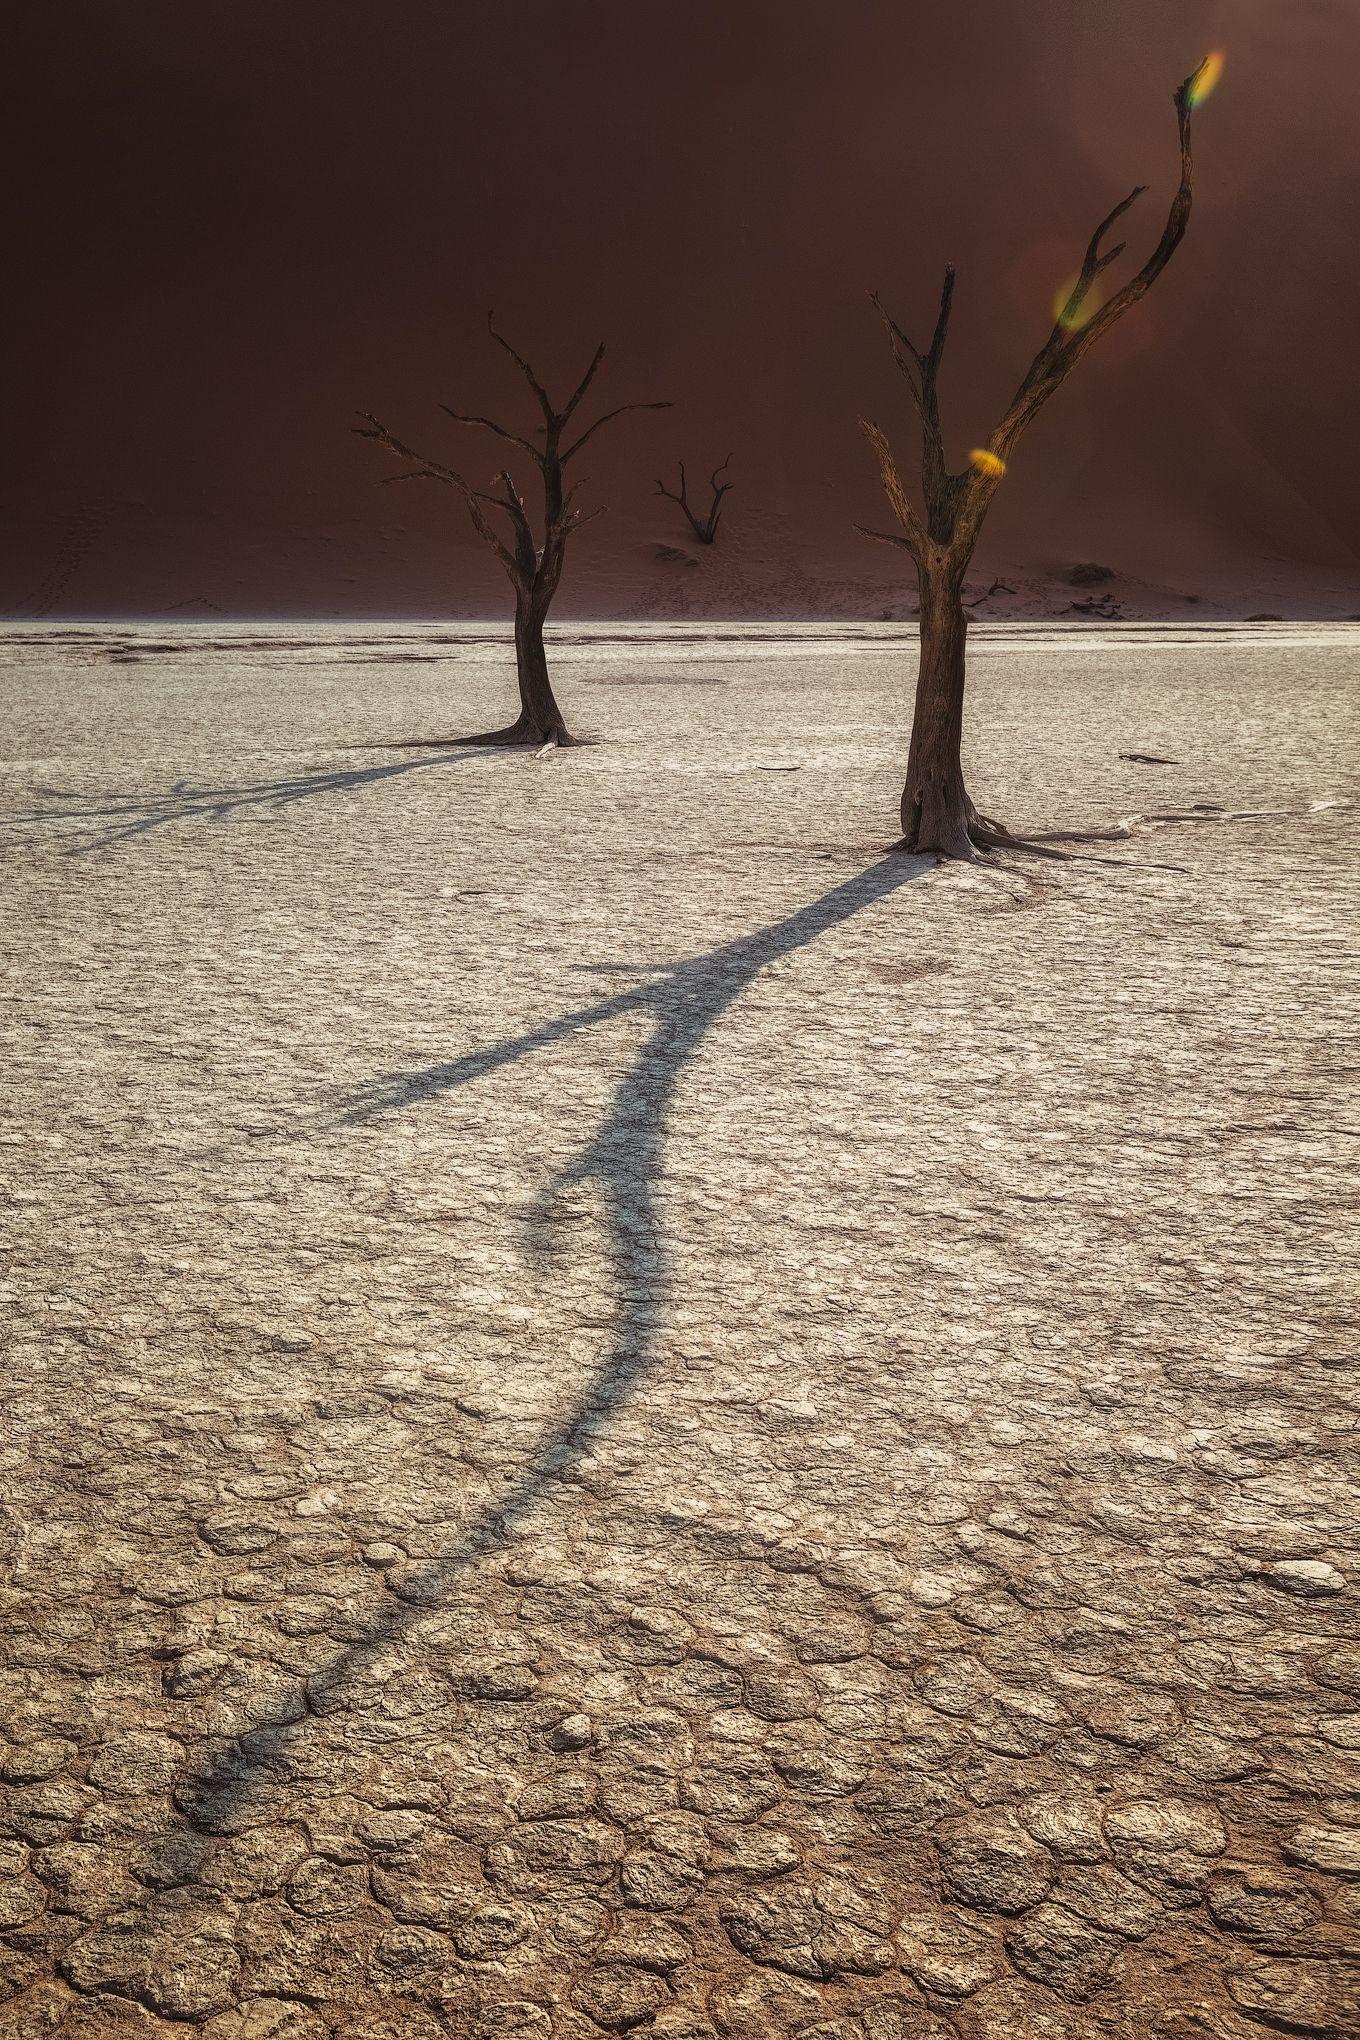 #тень, #дерево,#мертвая долина , #намибия, #африка, #дидвлей, #дюна,#озеро, #africa ,#namibia ,#tree ,#dune ,#deadvley valley ,#deadvley #lake, Деркач Наталия